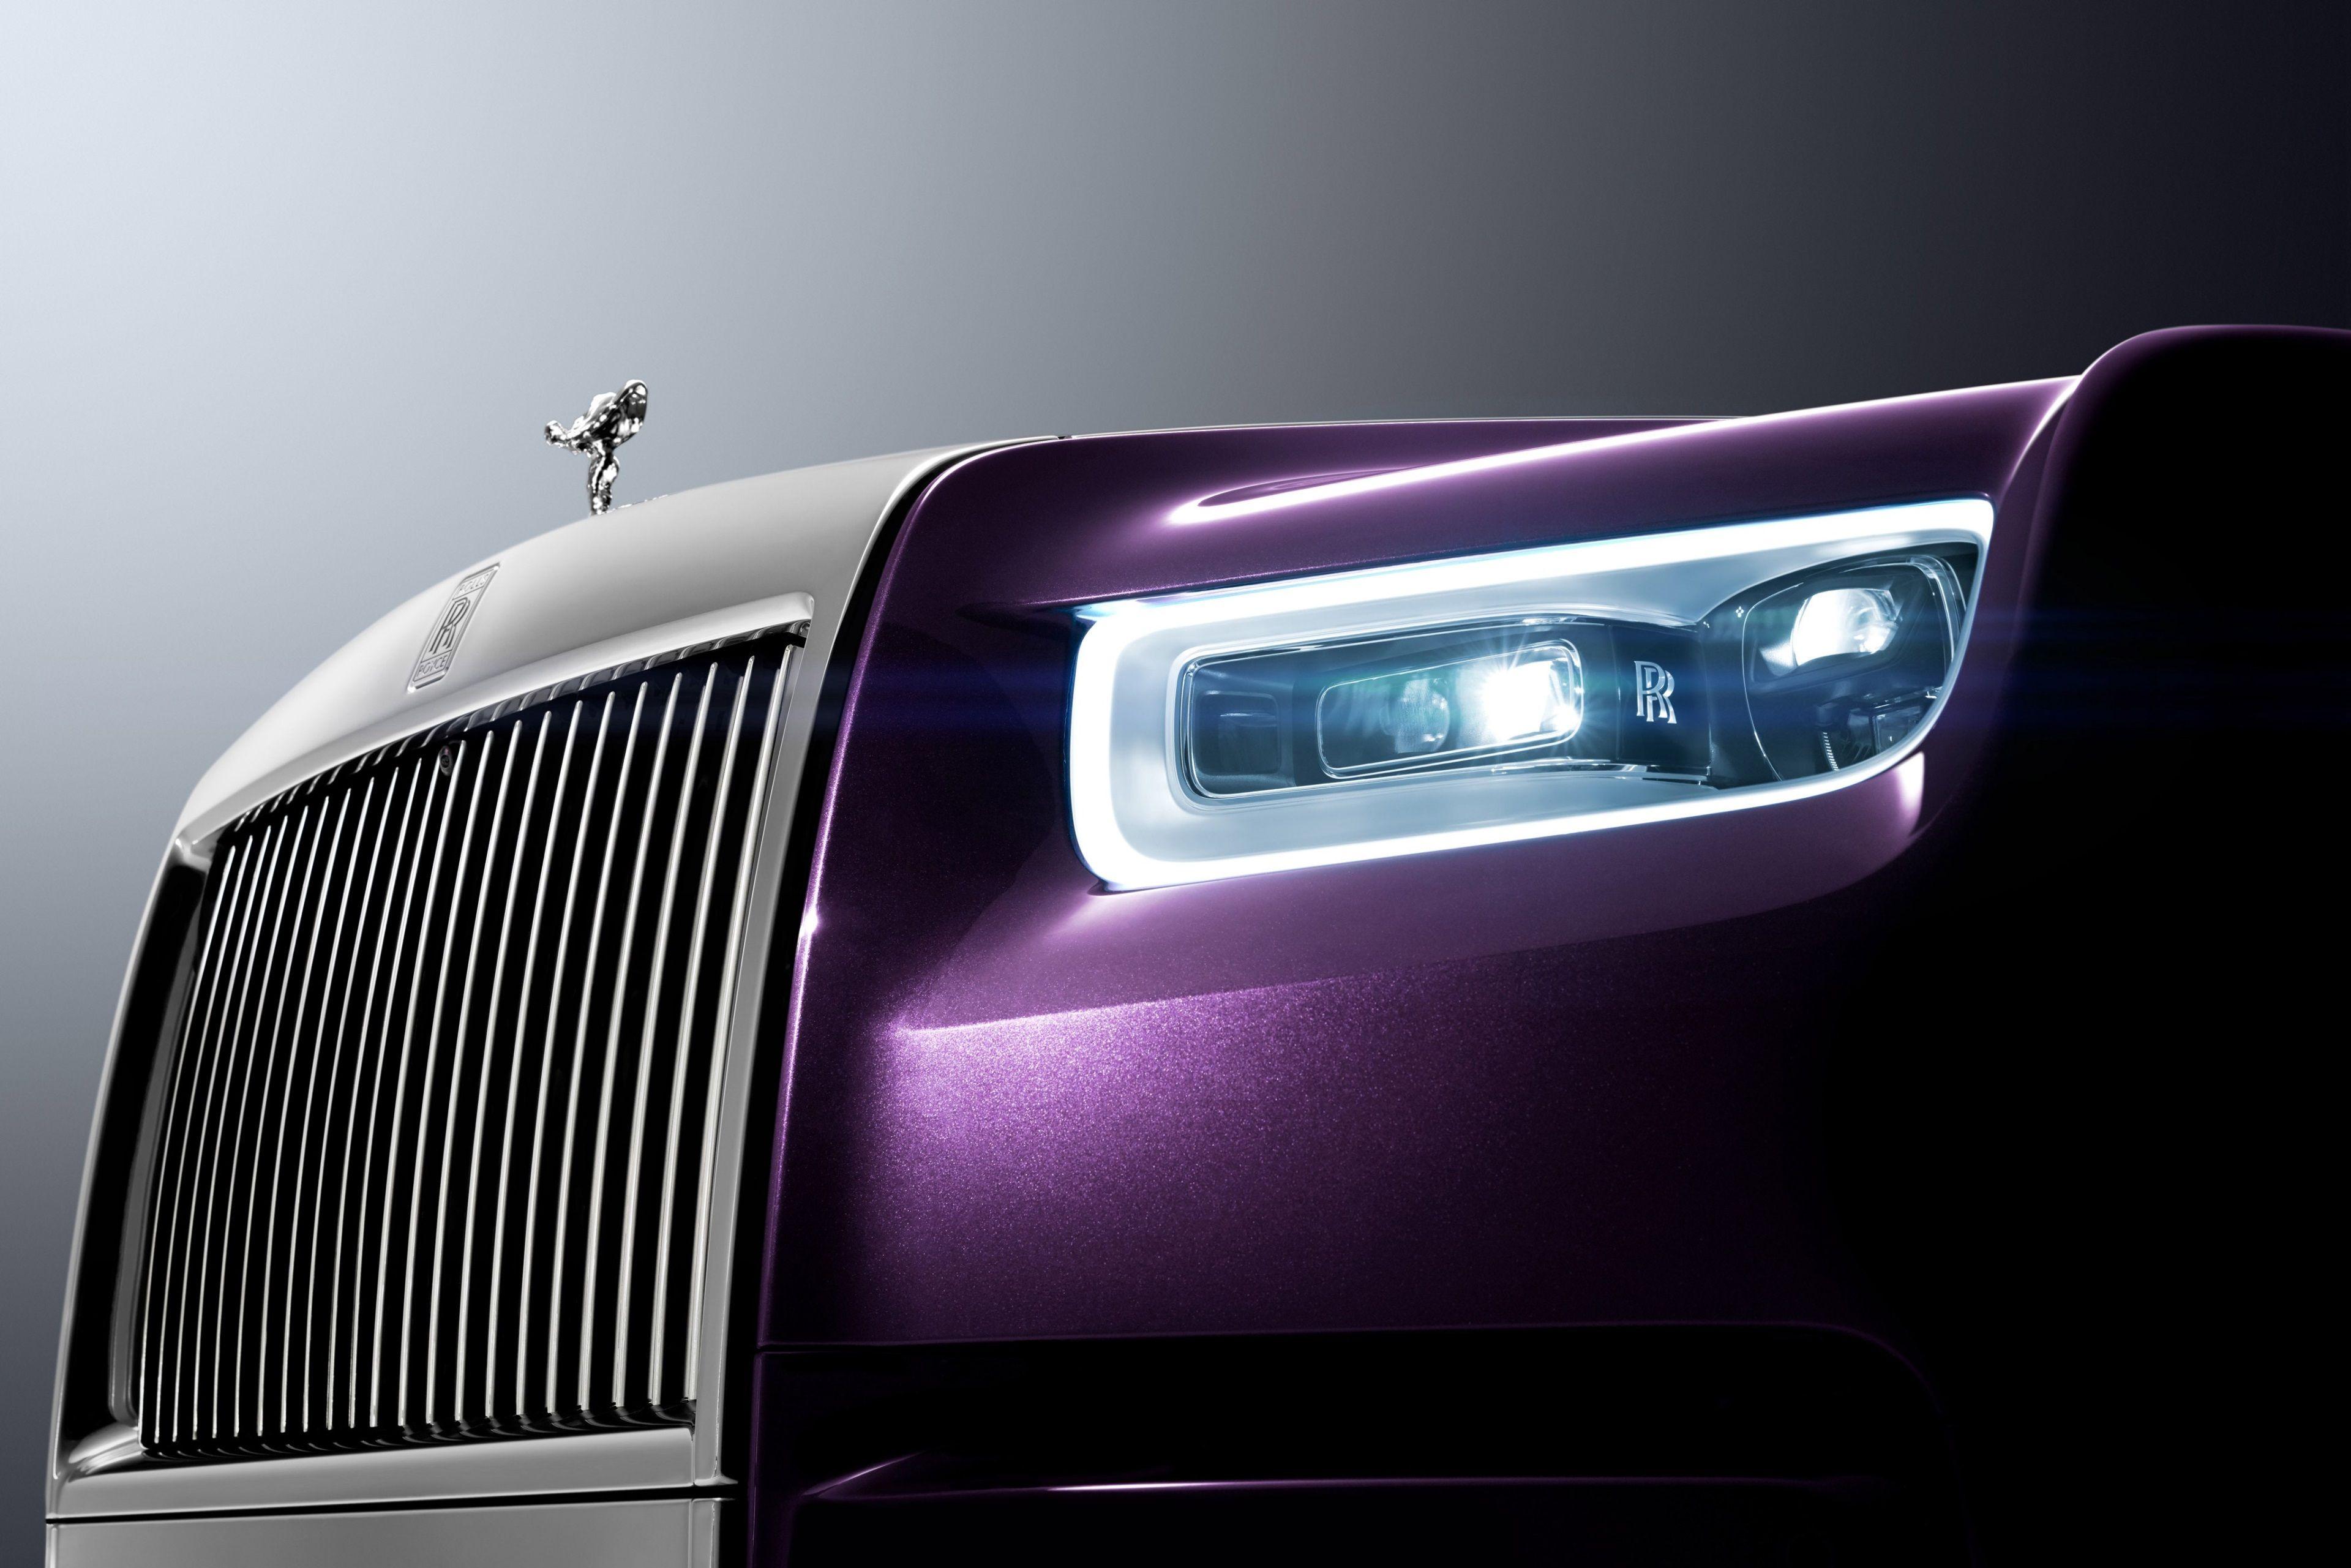 3840x2561 Rolls Royce Phantom Ewb 4k Desktop Hd Wallpaper